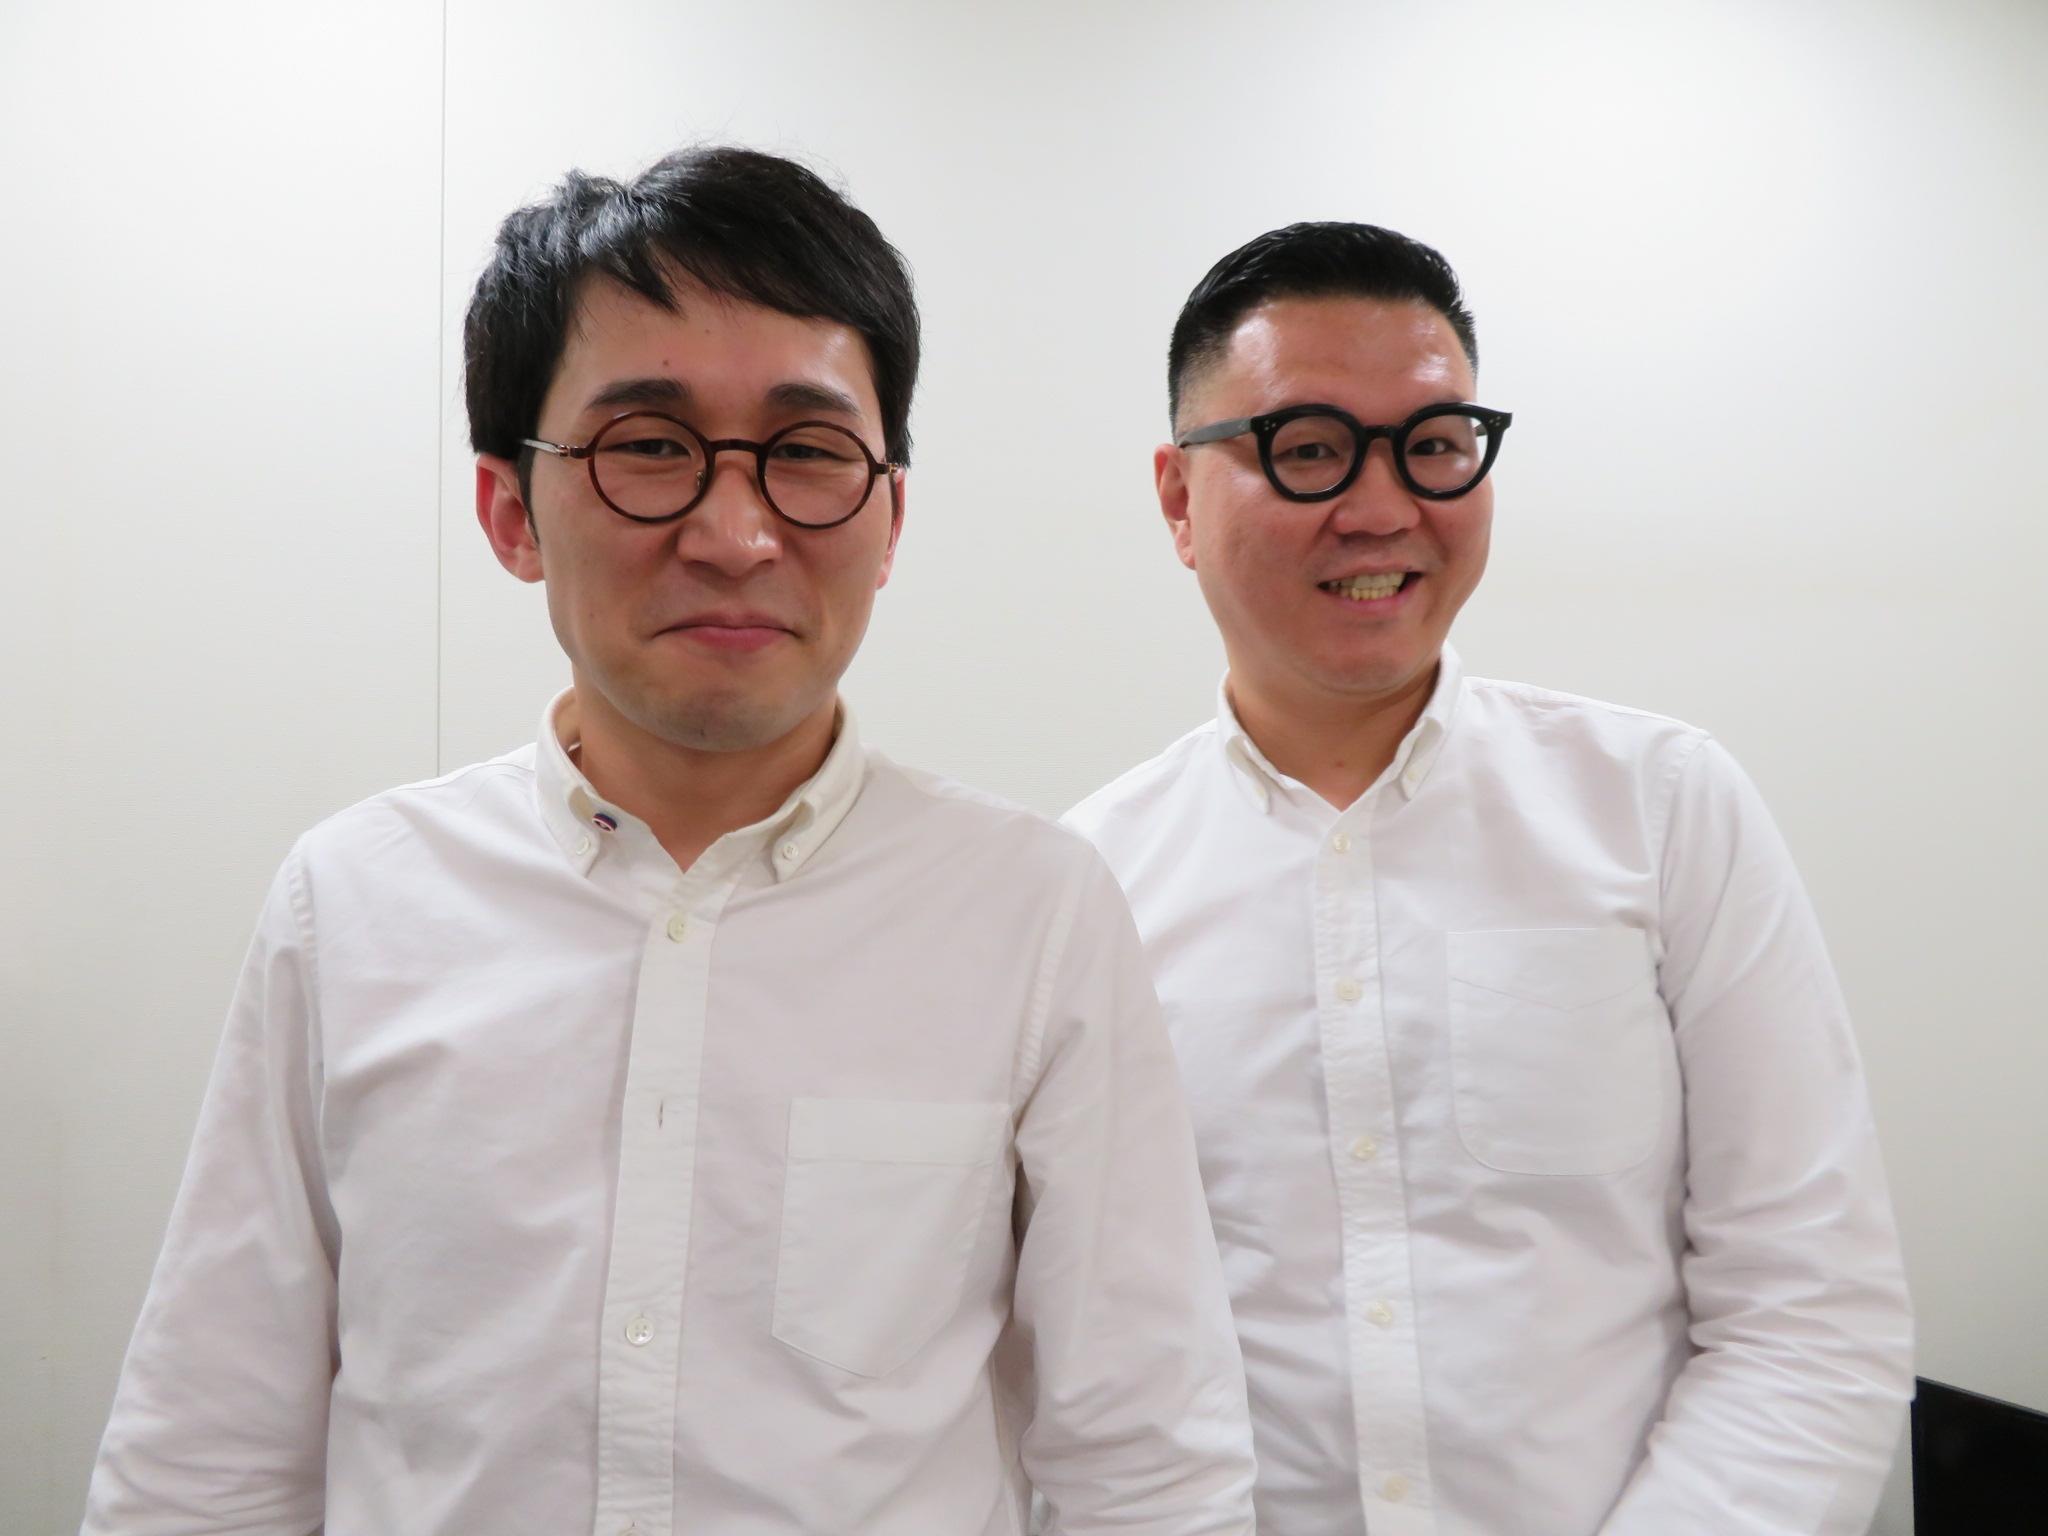 http://news.yoshimoto.co.jp/20180306205942-12bfbcb6f551d439e2a1fef89aea637d70f4dc99.jpg